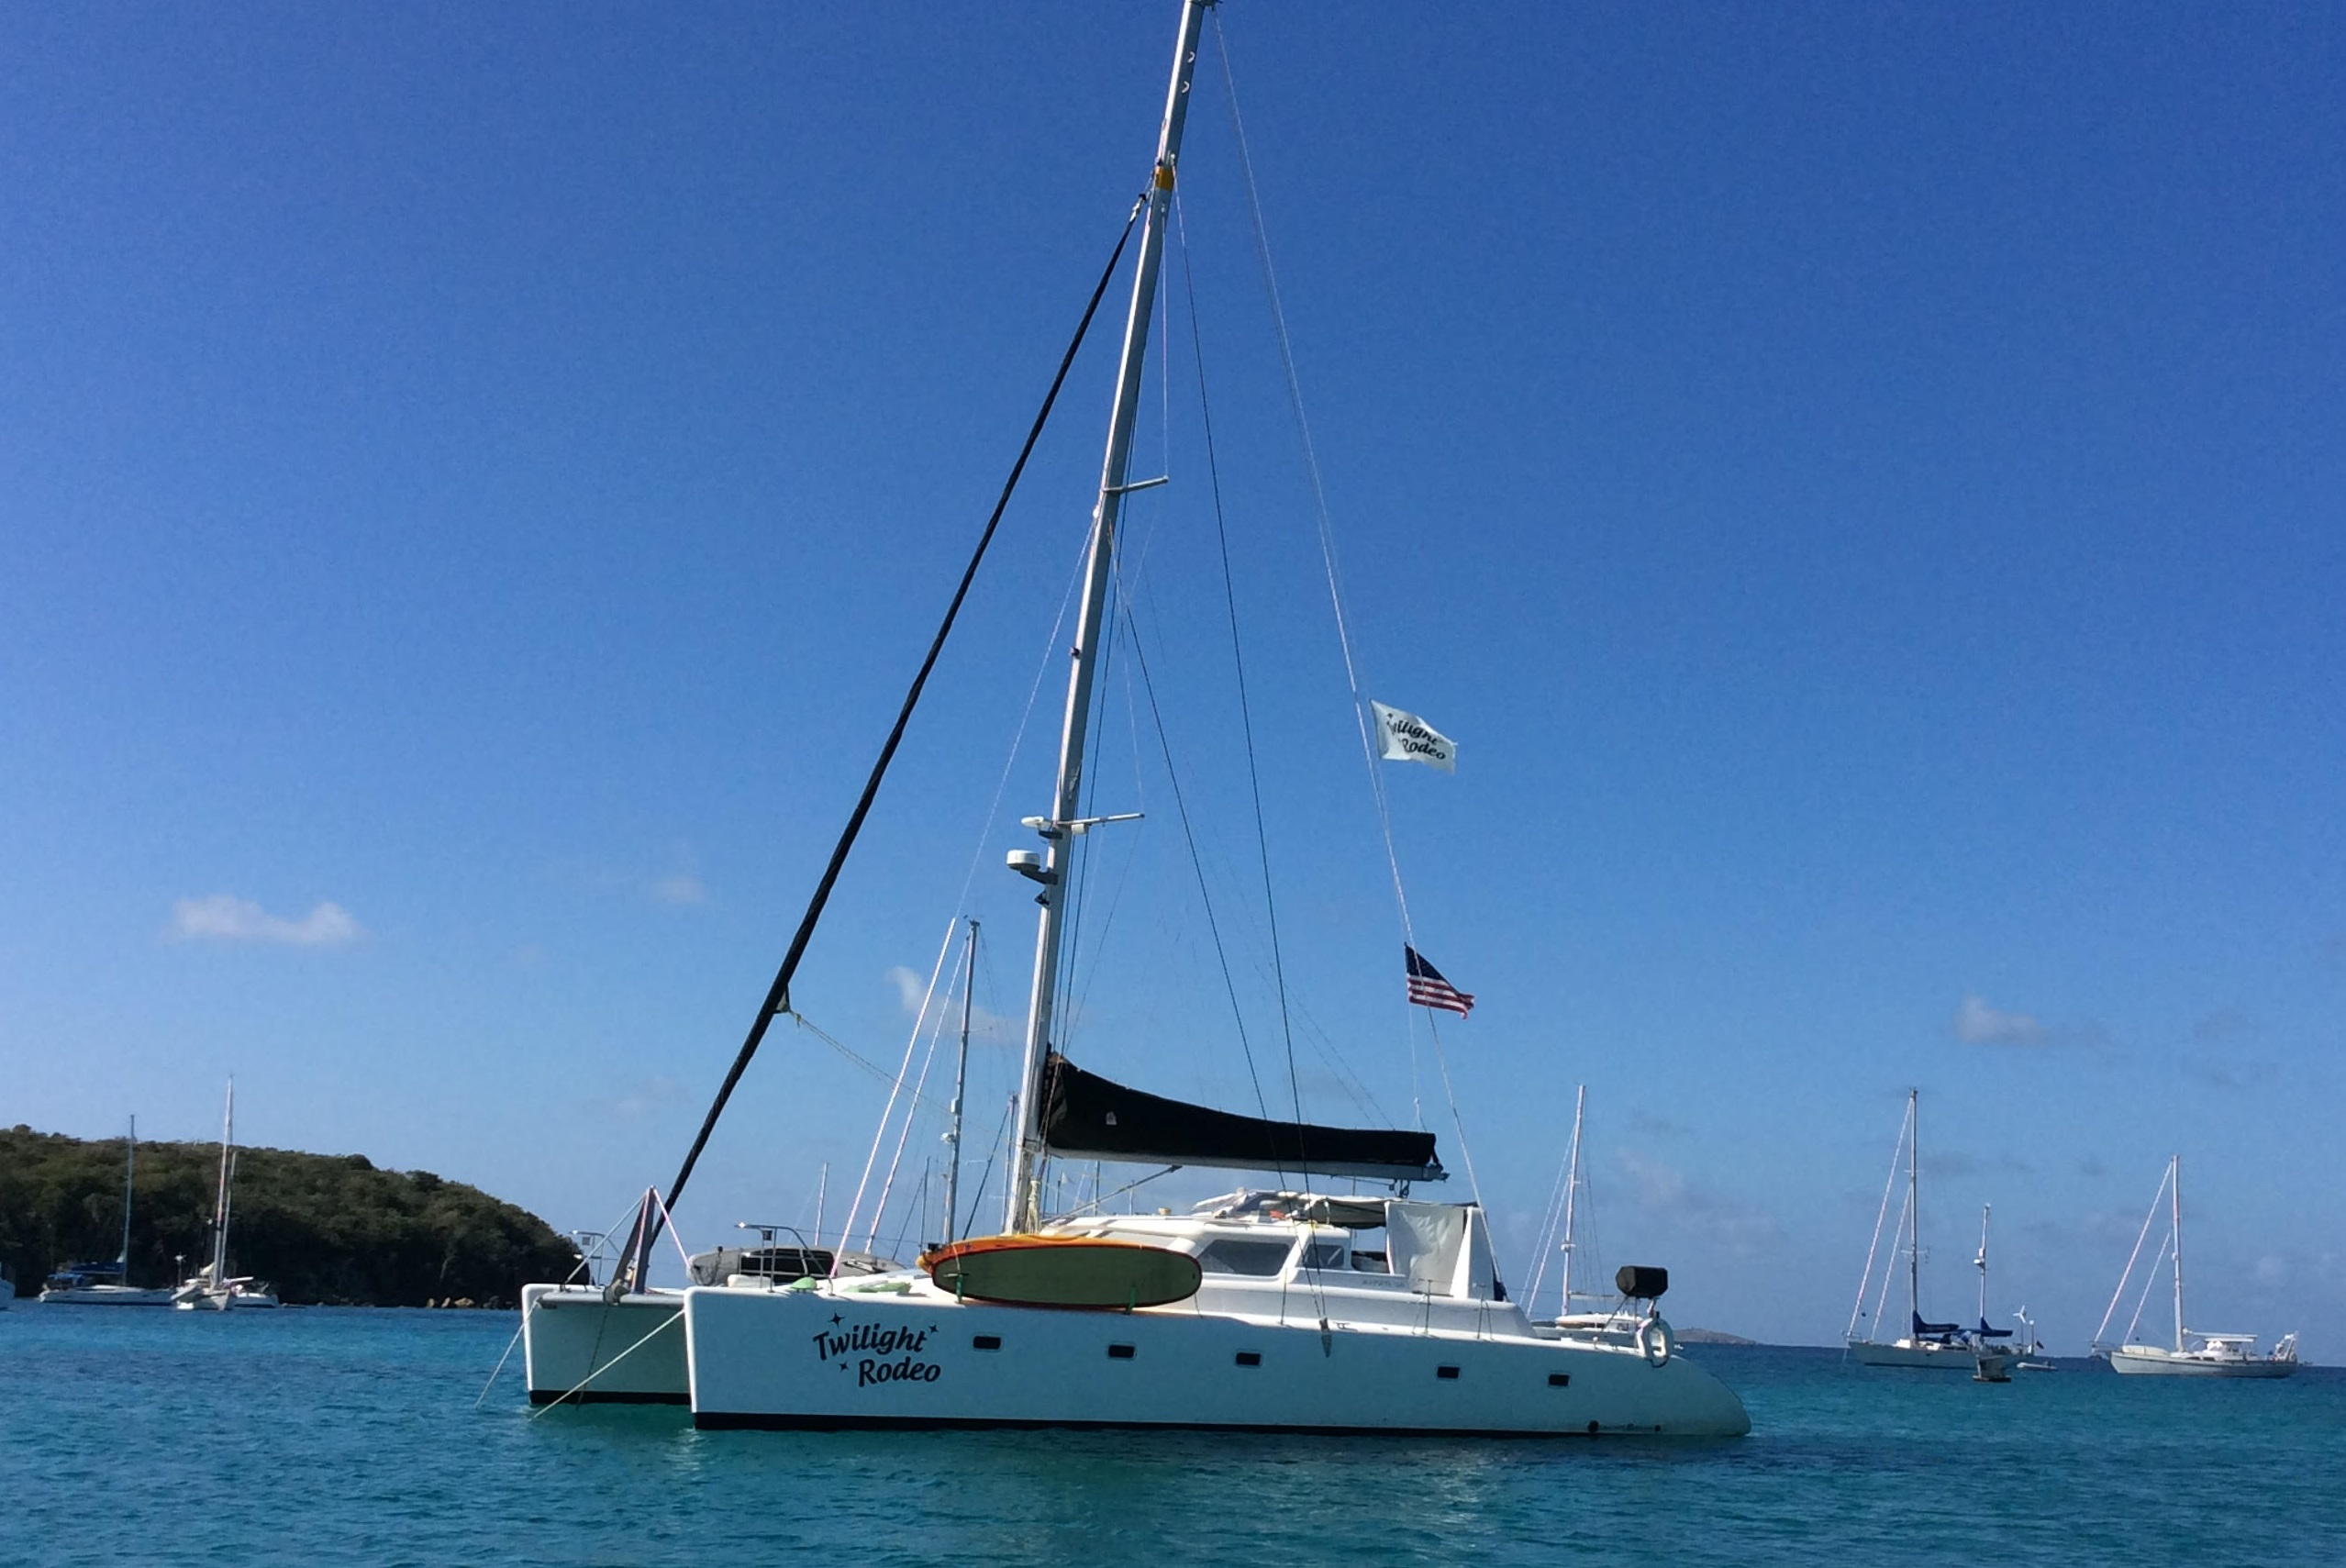 U.S. Virgin Islands, St. Thomas. Yacht Twilight Rodeo